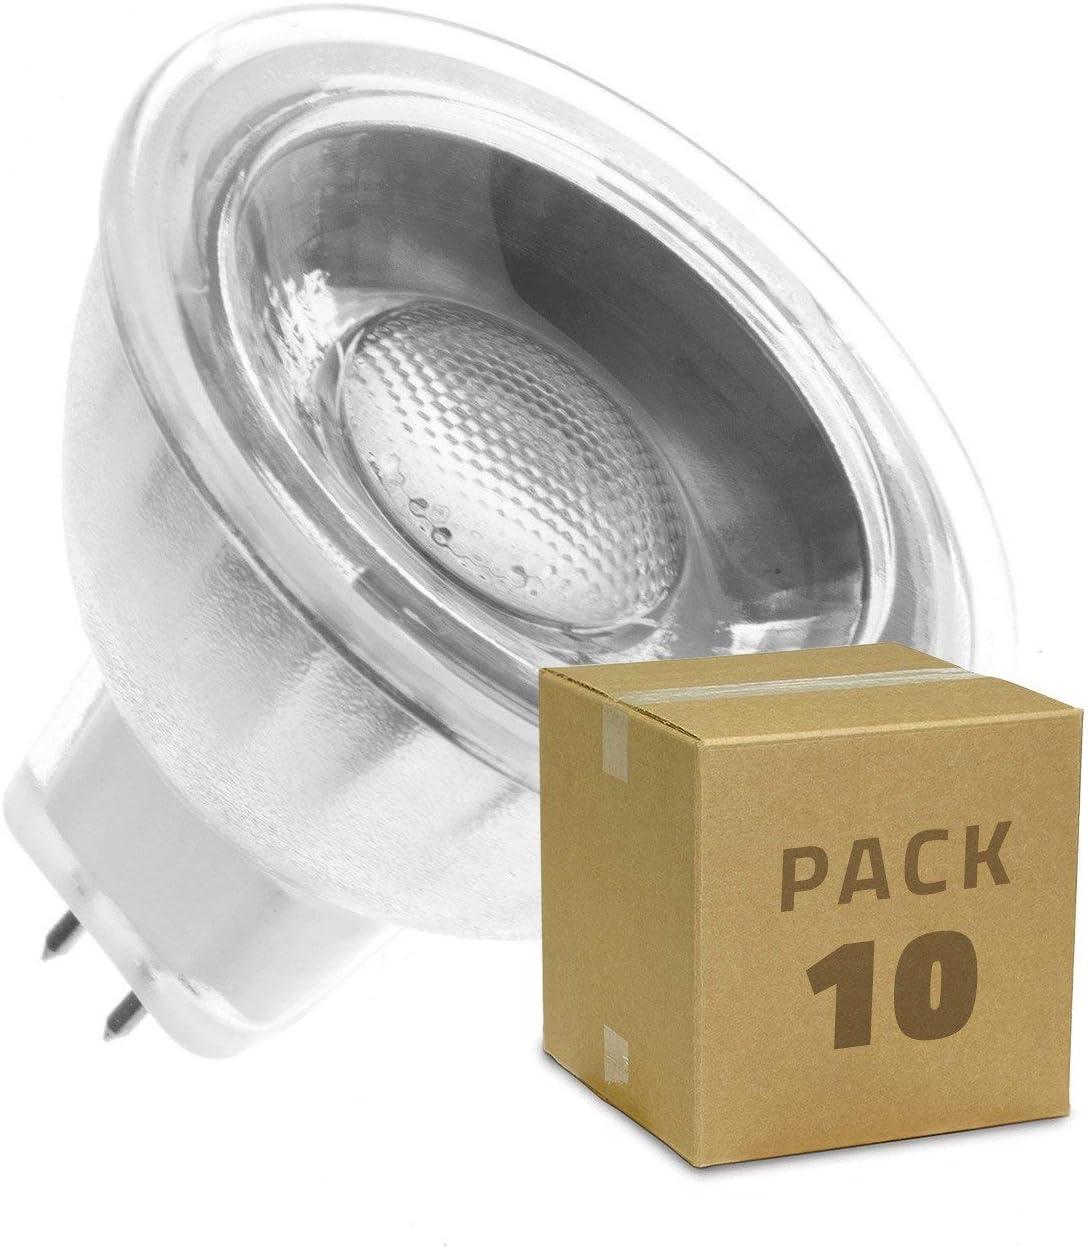 Pack Bombillas LED GU5.3 MR16 COB Cristal 220V 45º 5W (10 un) Blanco Cálido 3000K